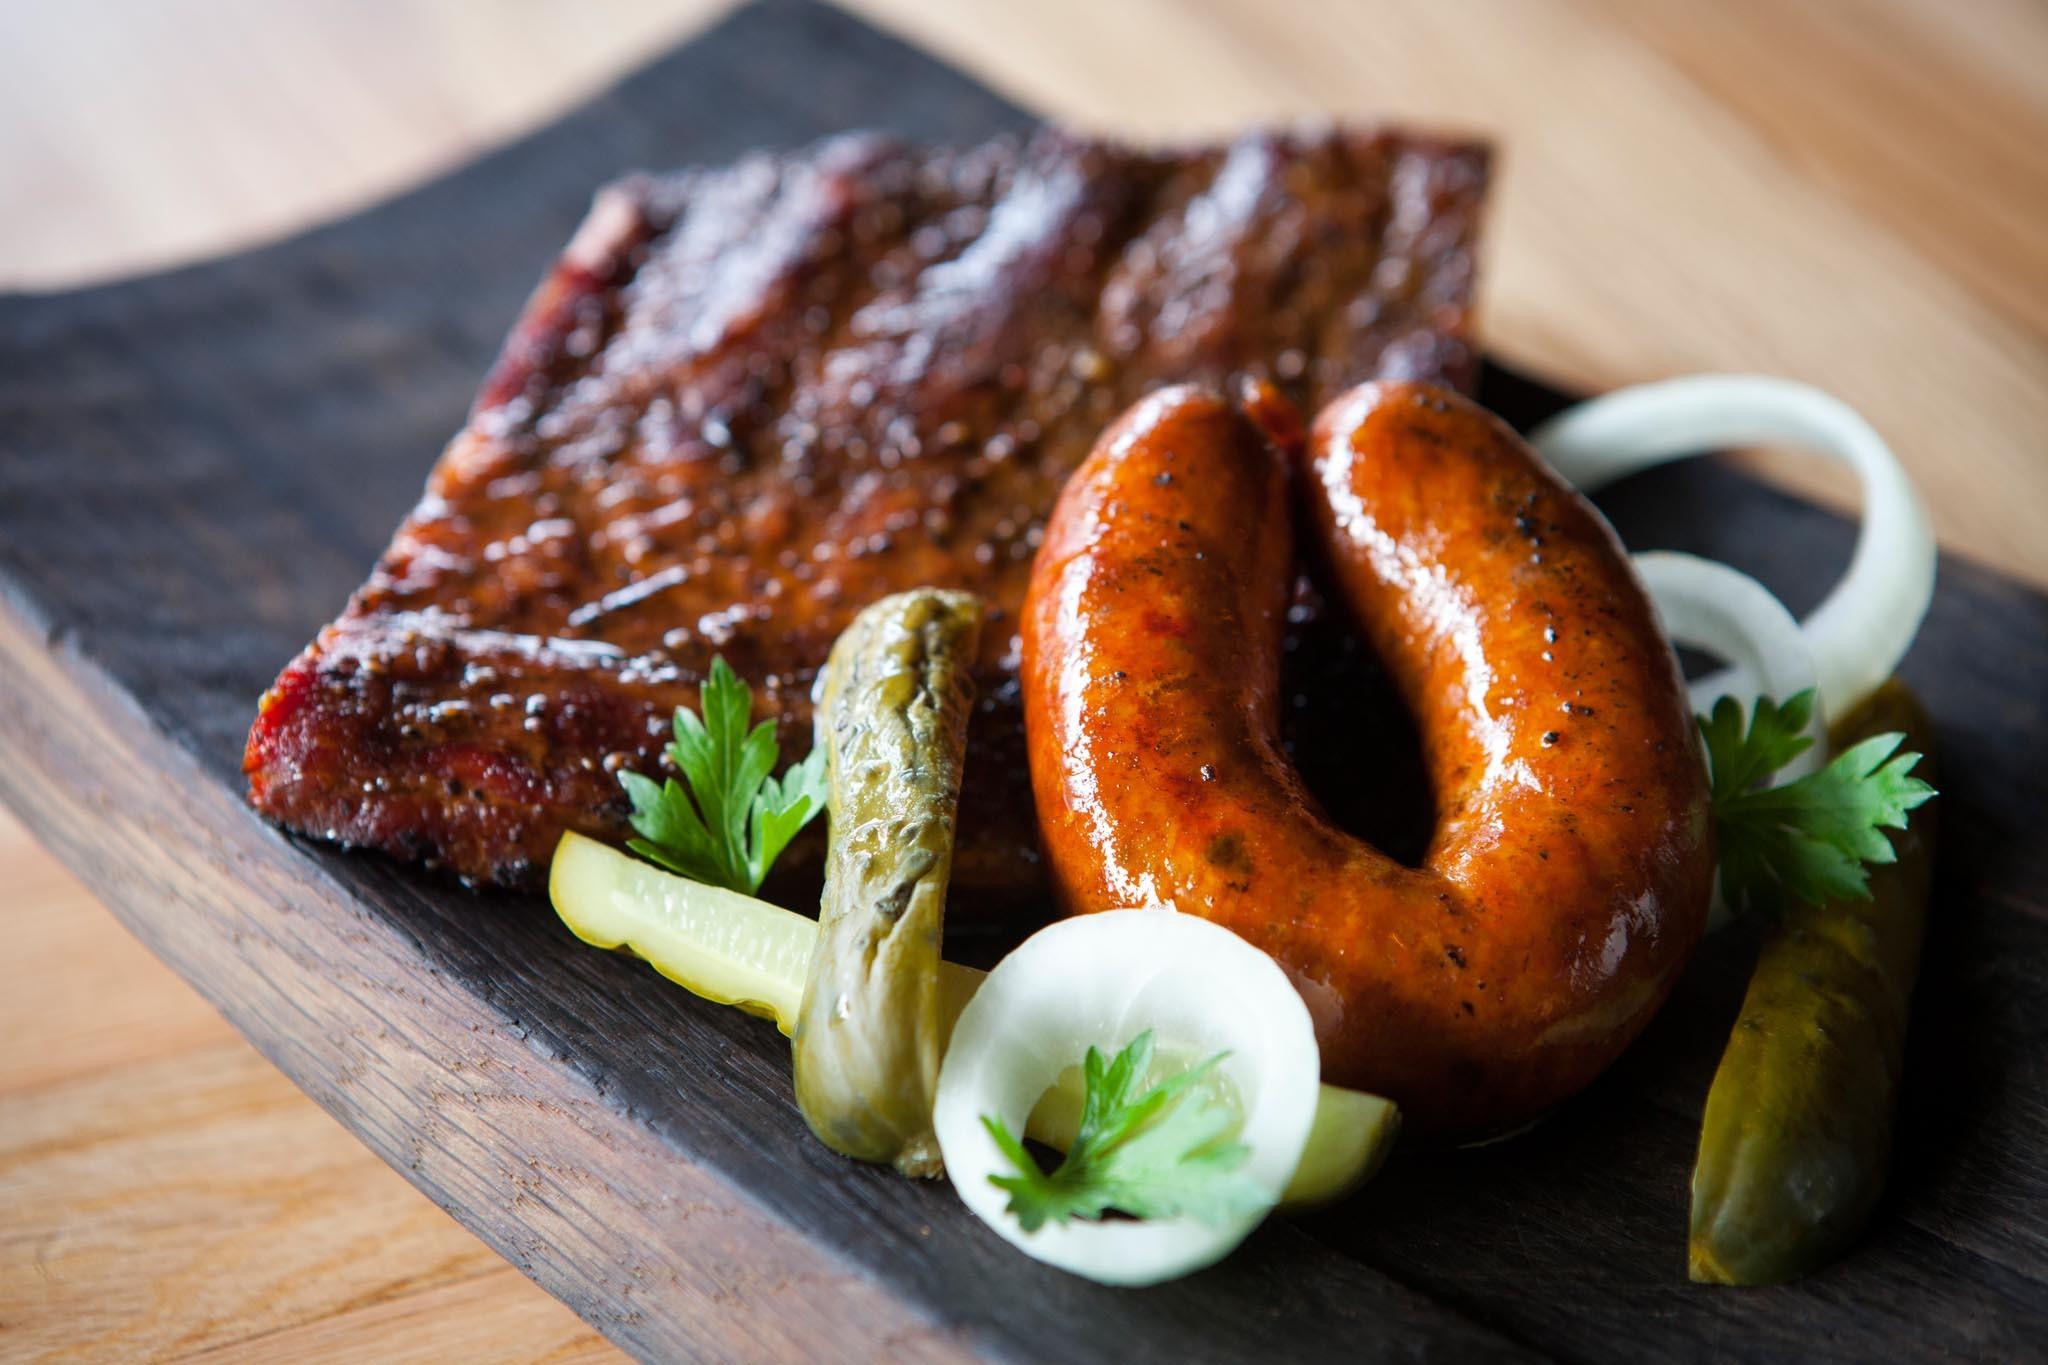 1/2lb spare ribs plus sausage at Barrel & Ashes